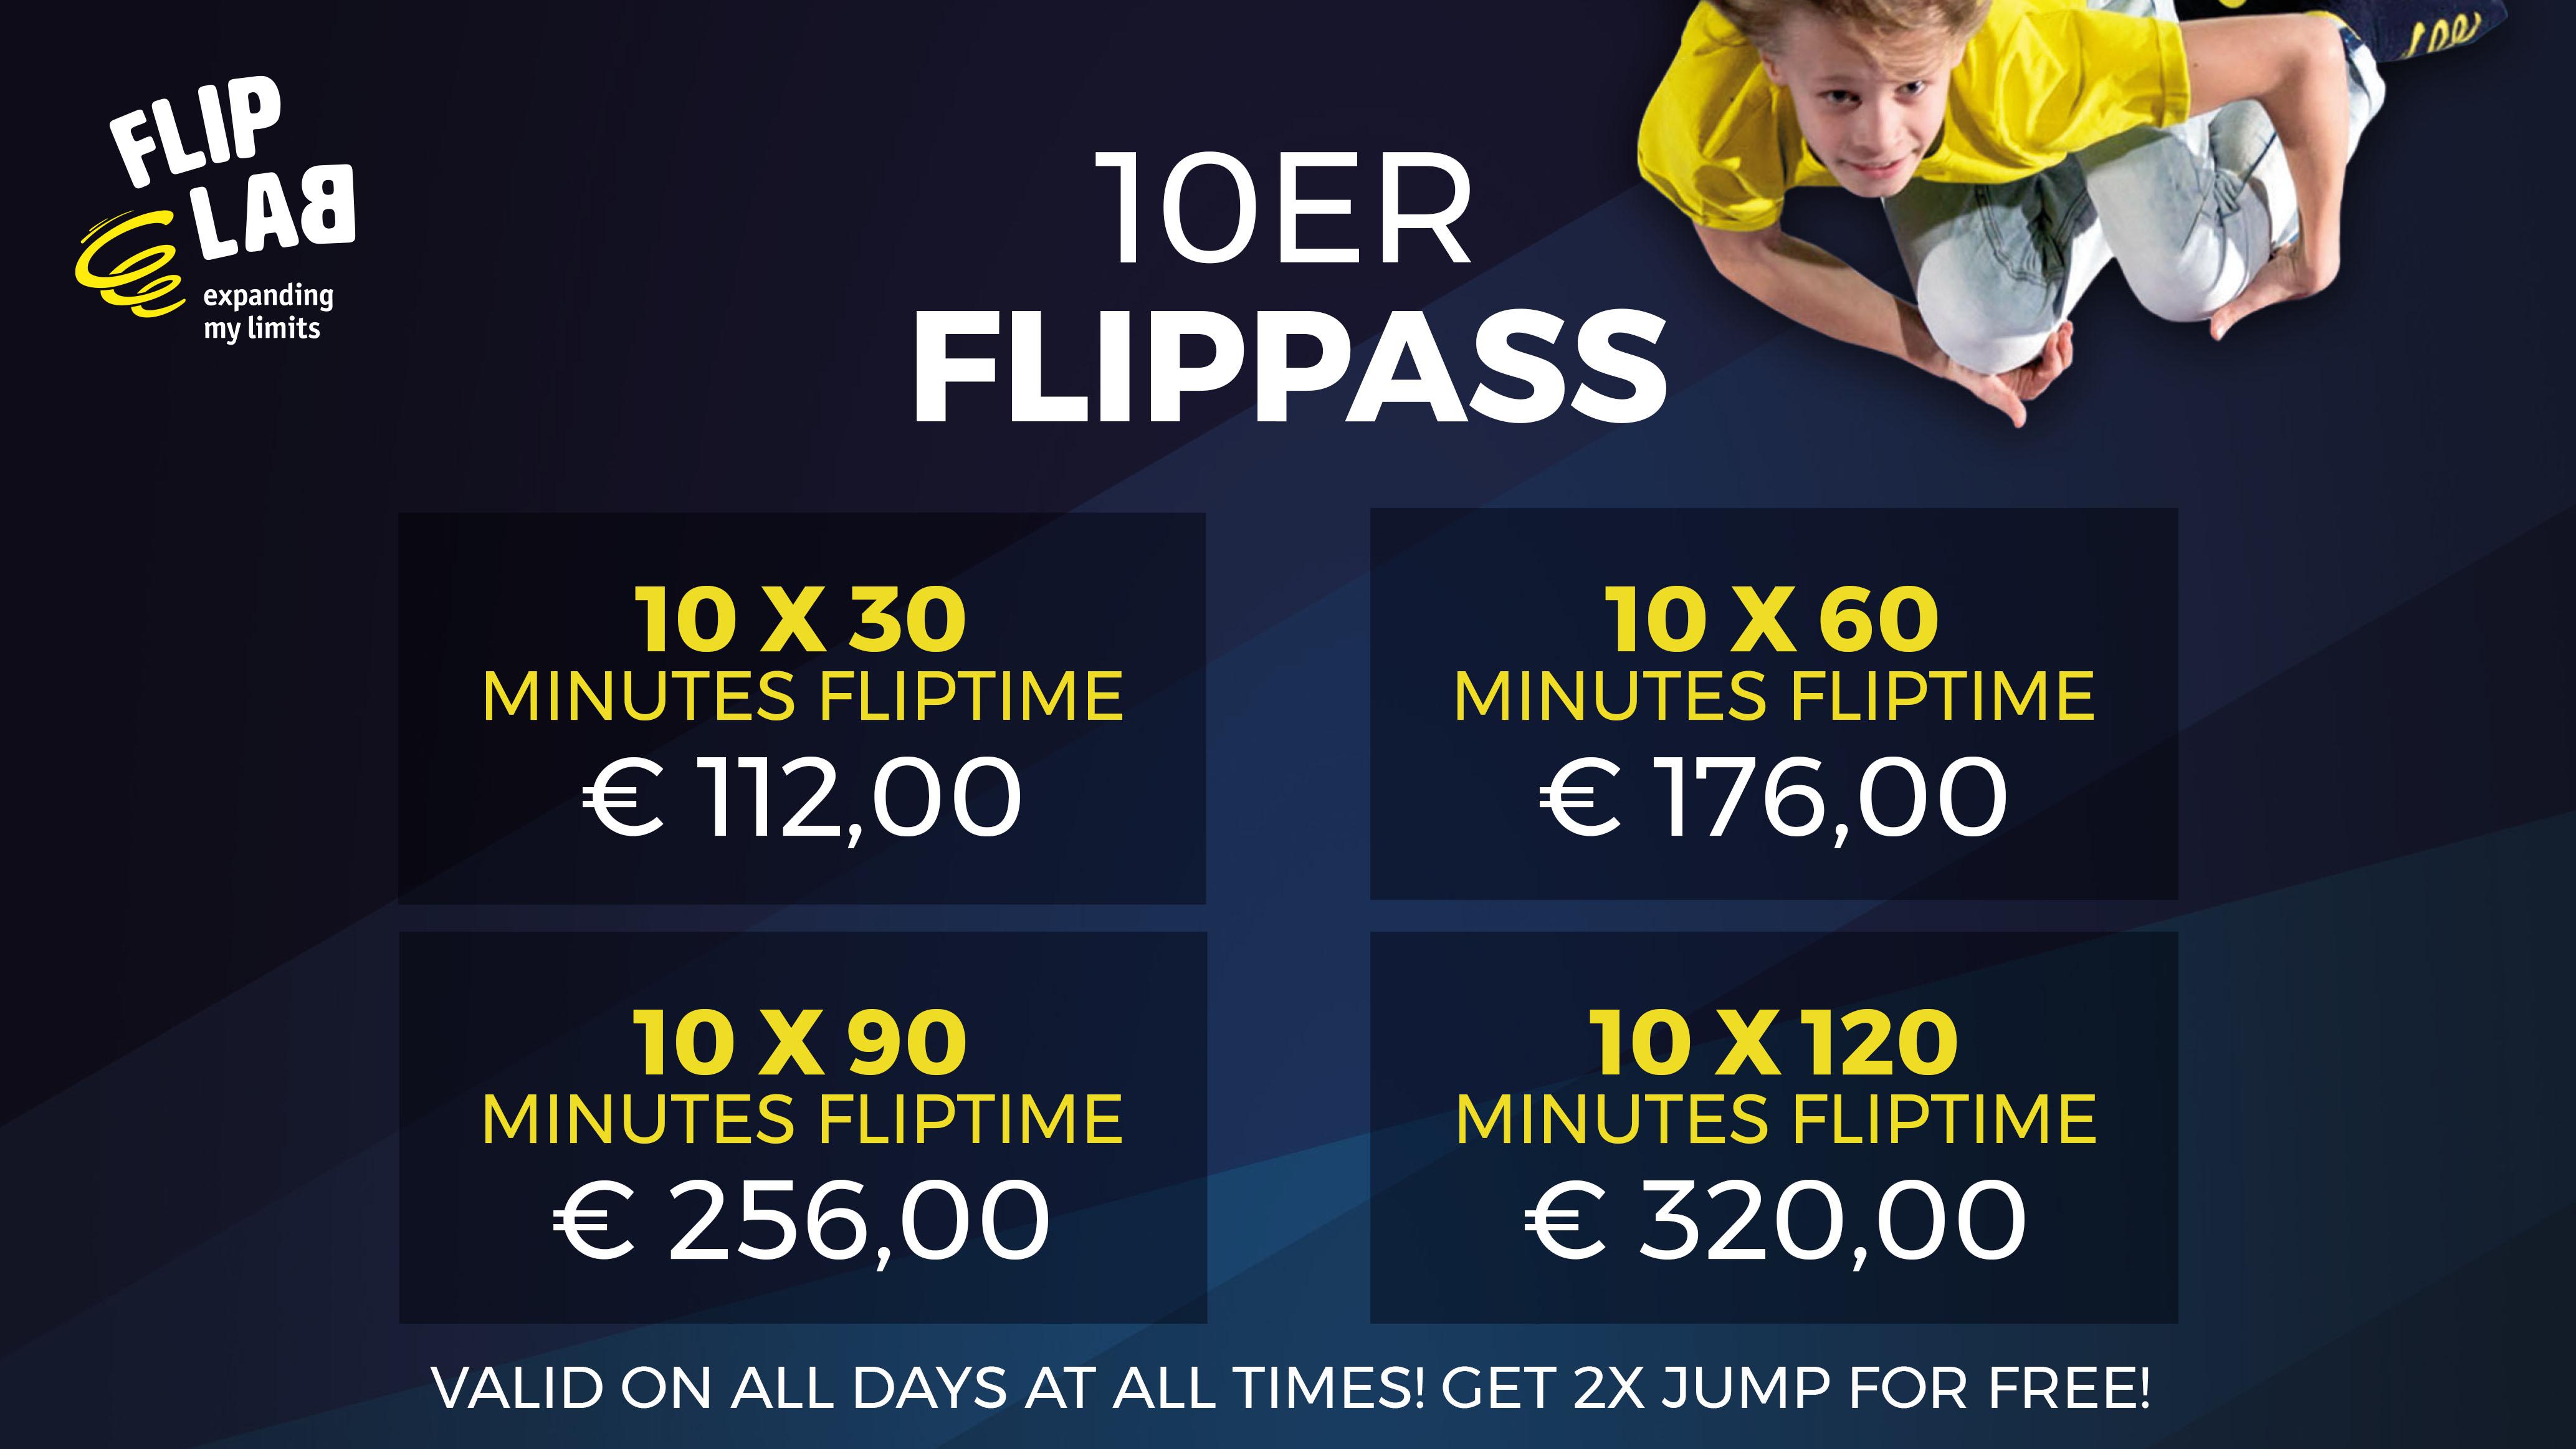 FlipLab Pass 10